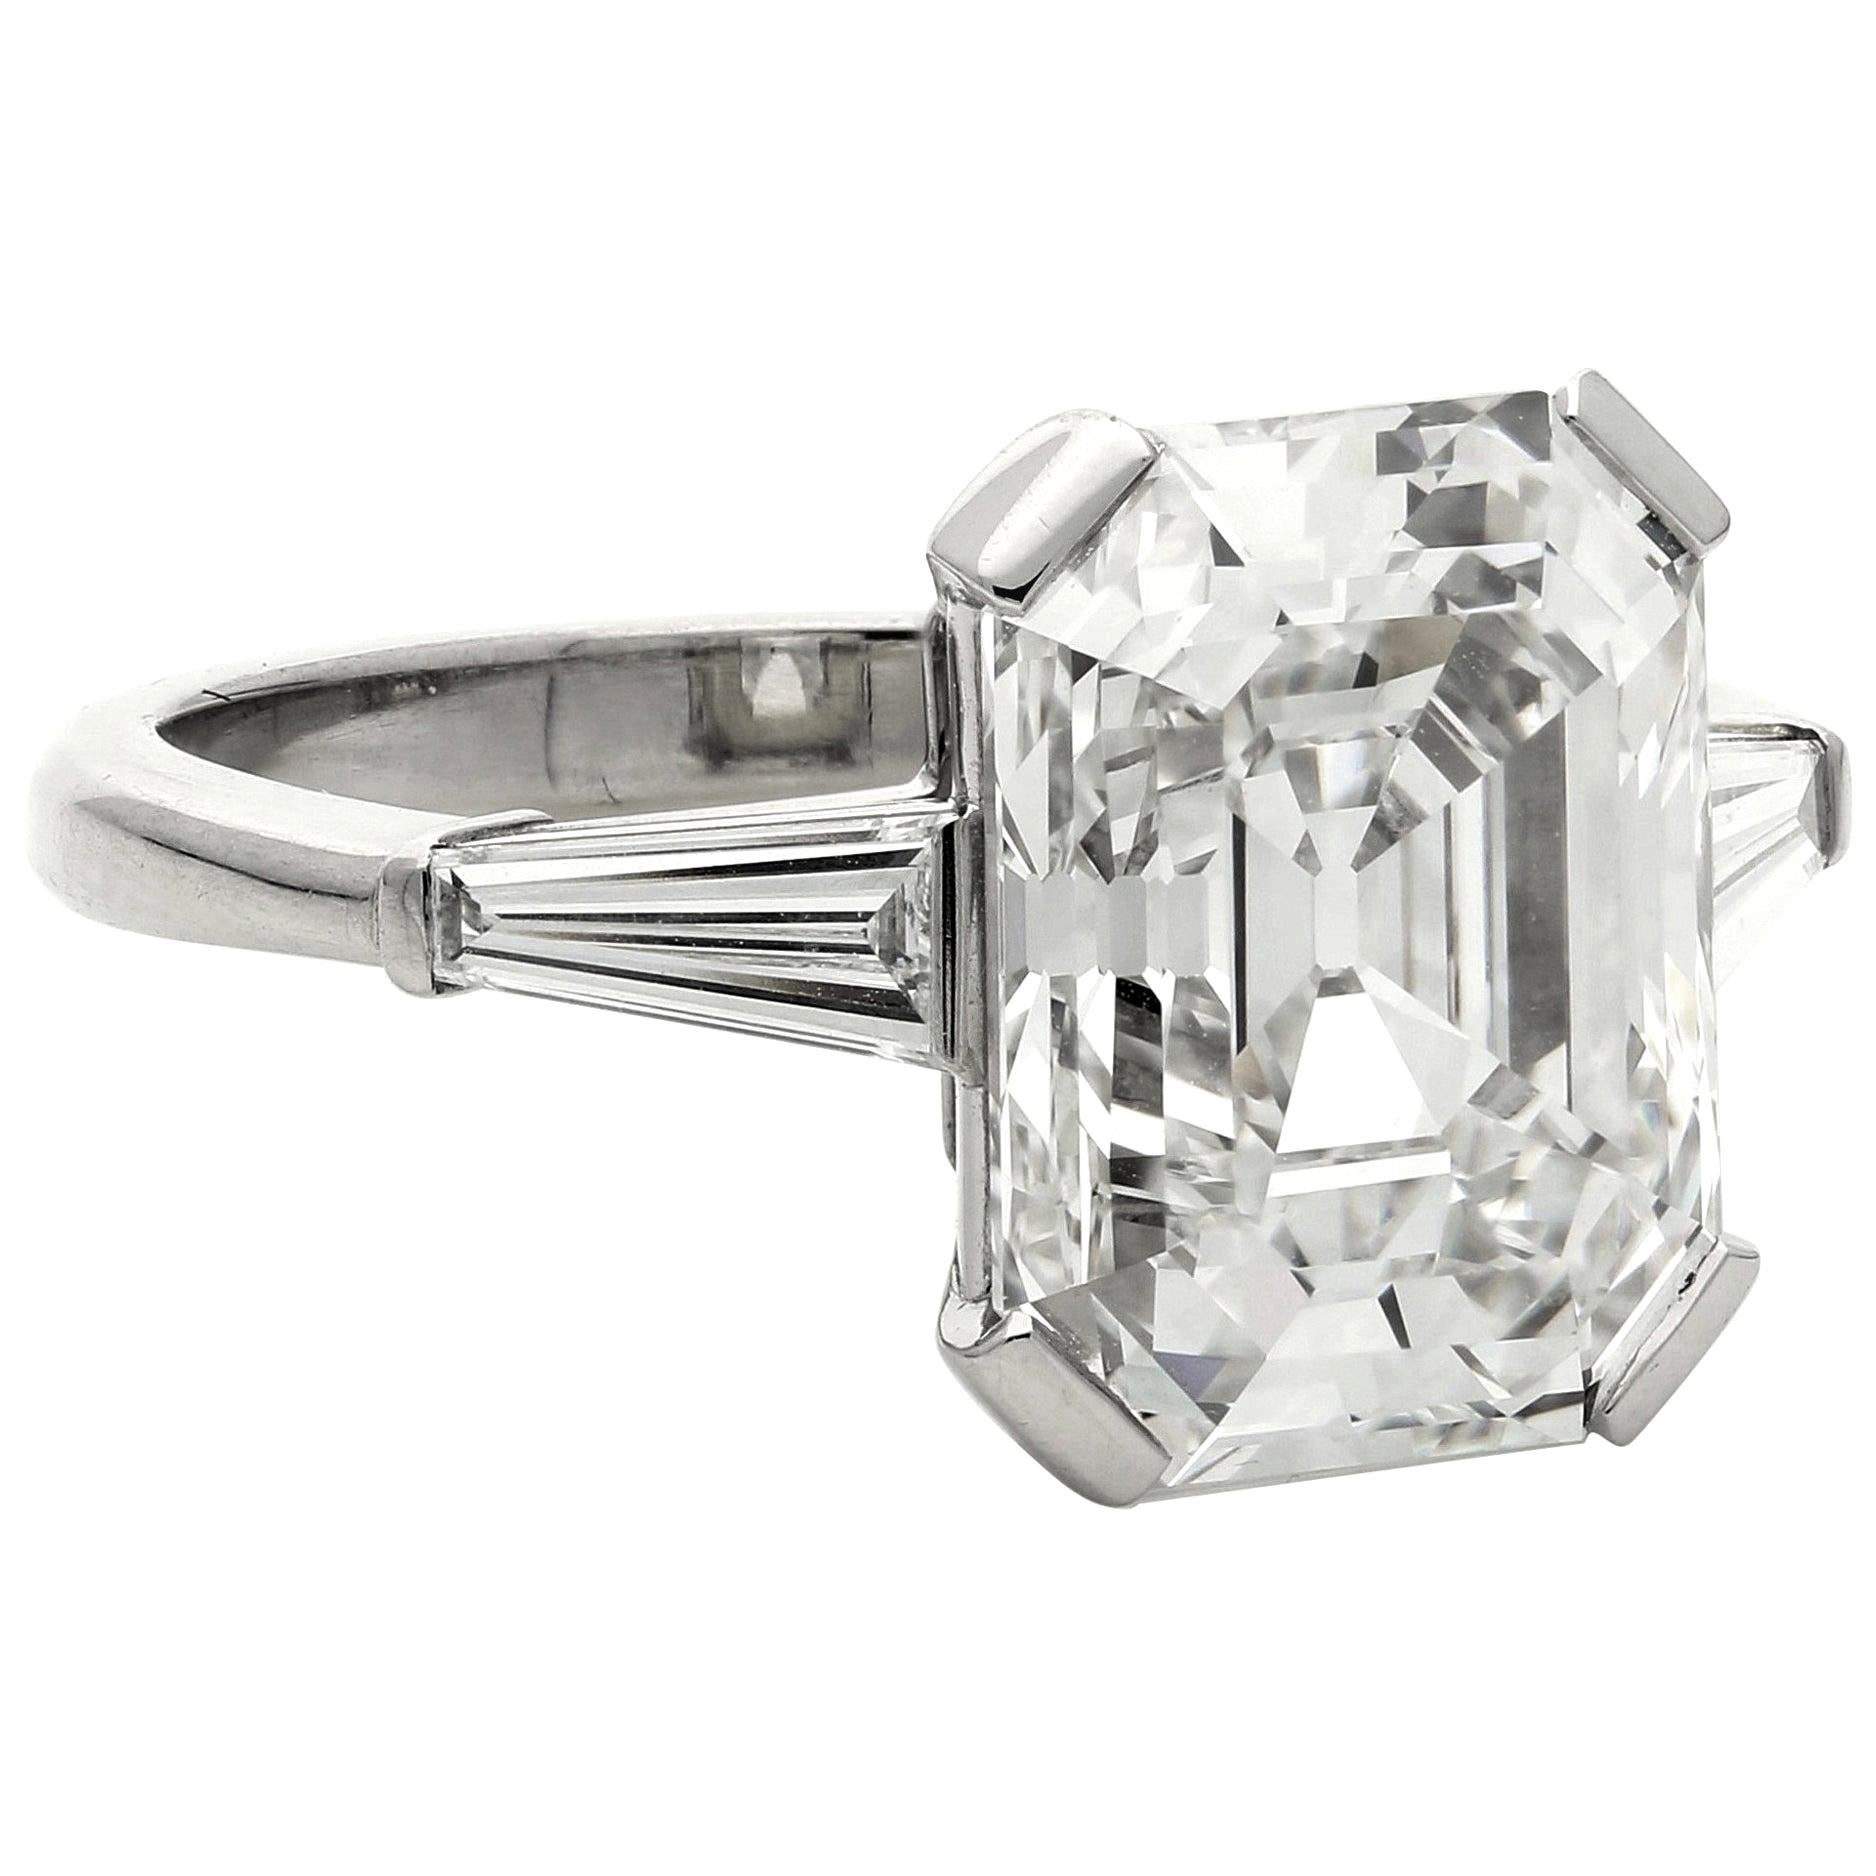 Hancocks 5.19 Carat G VVS2 Vintage Emerald-Cut Diamond Platinum Ring